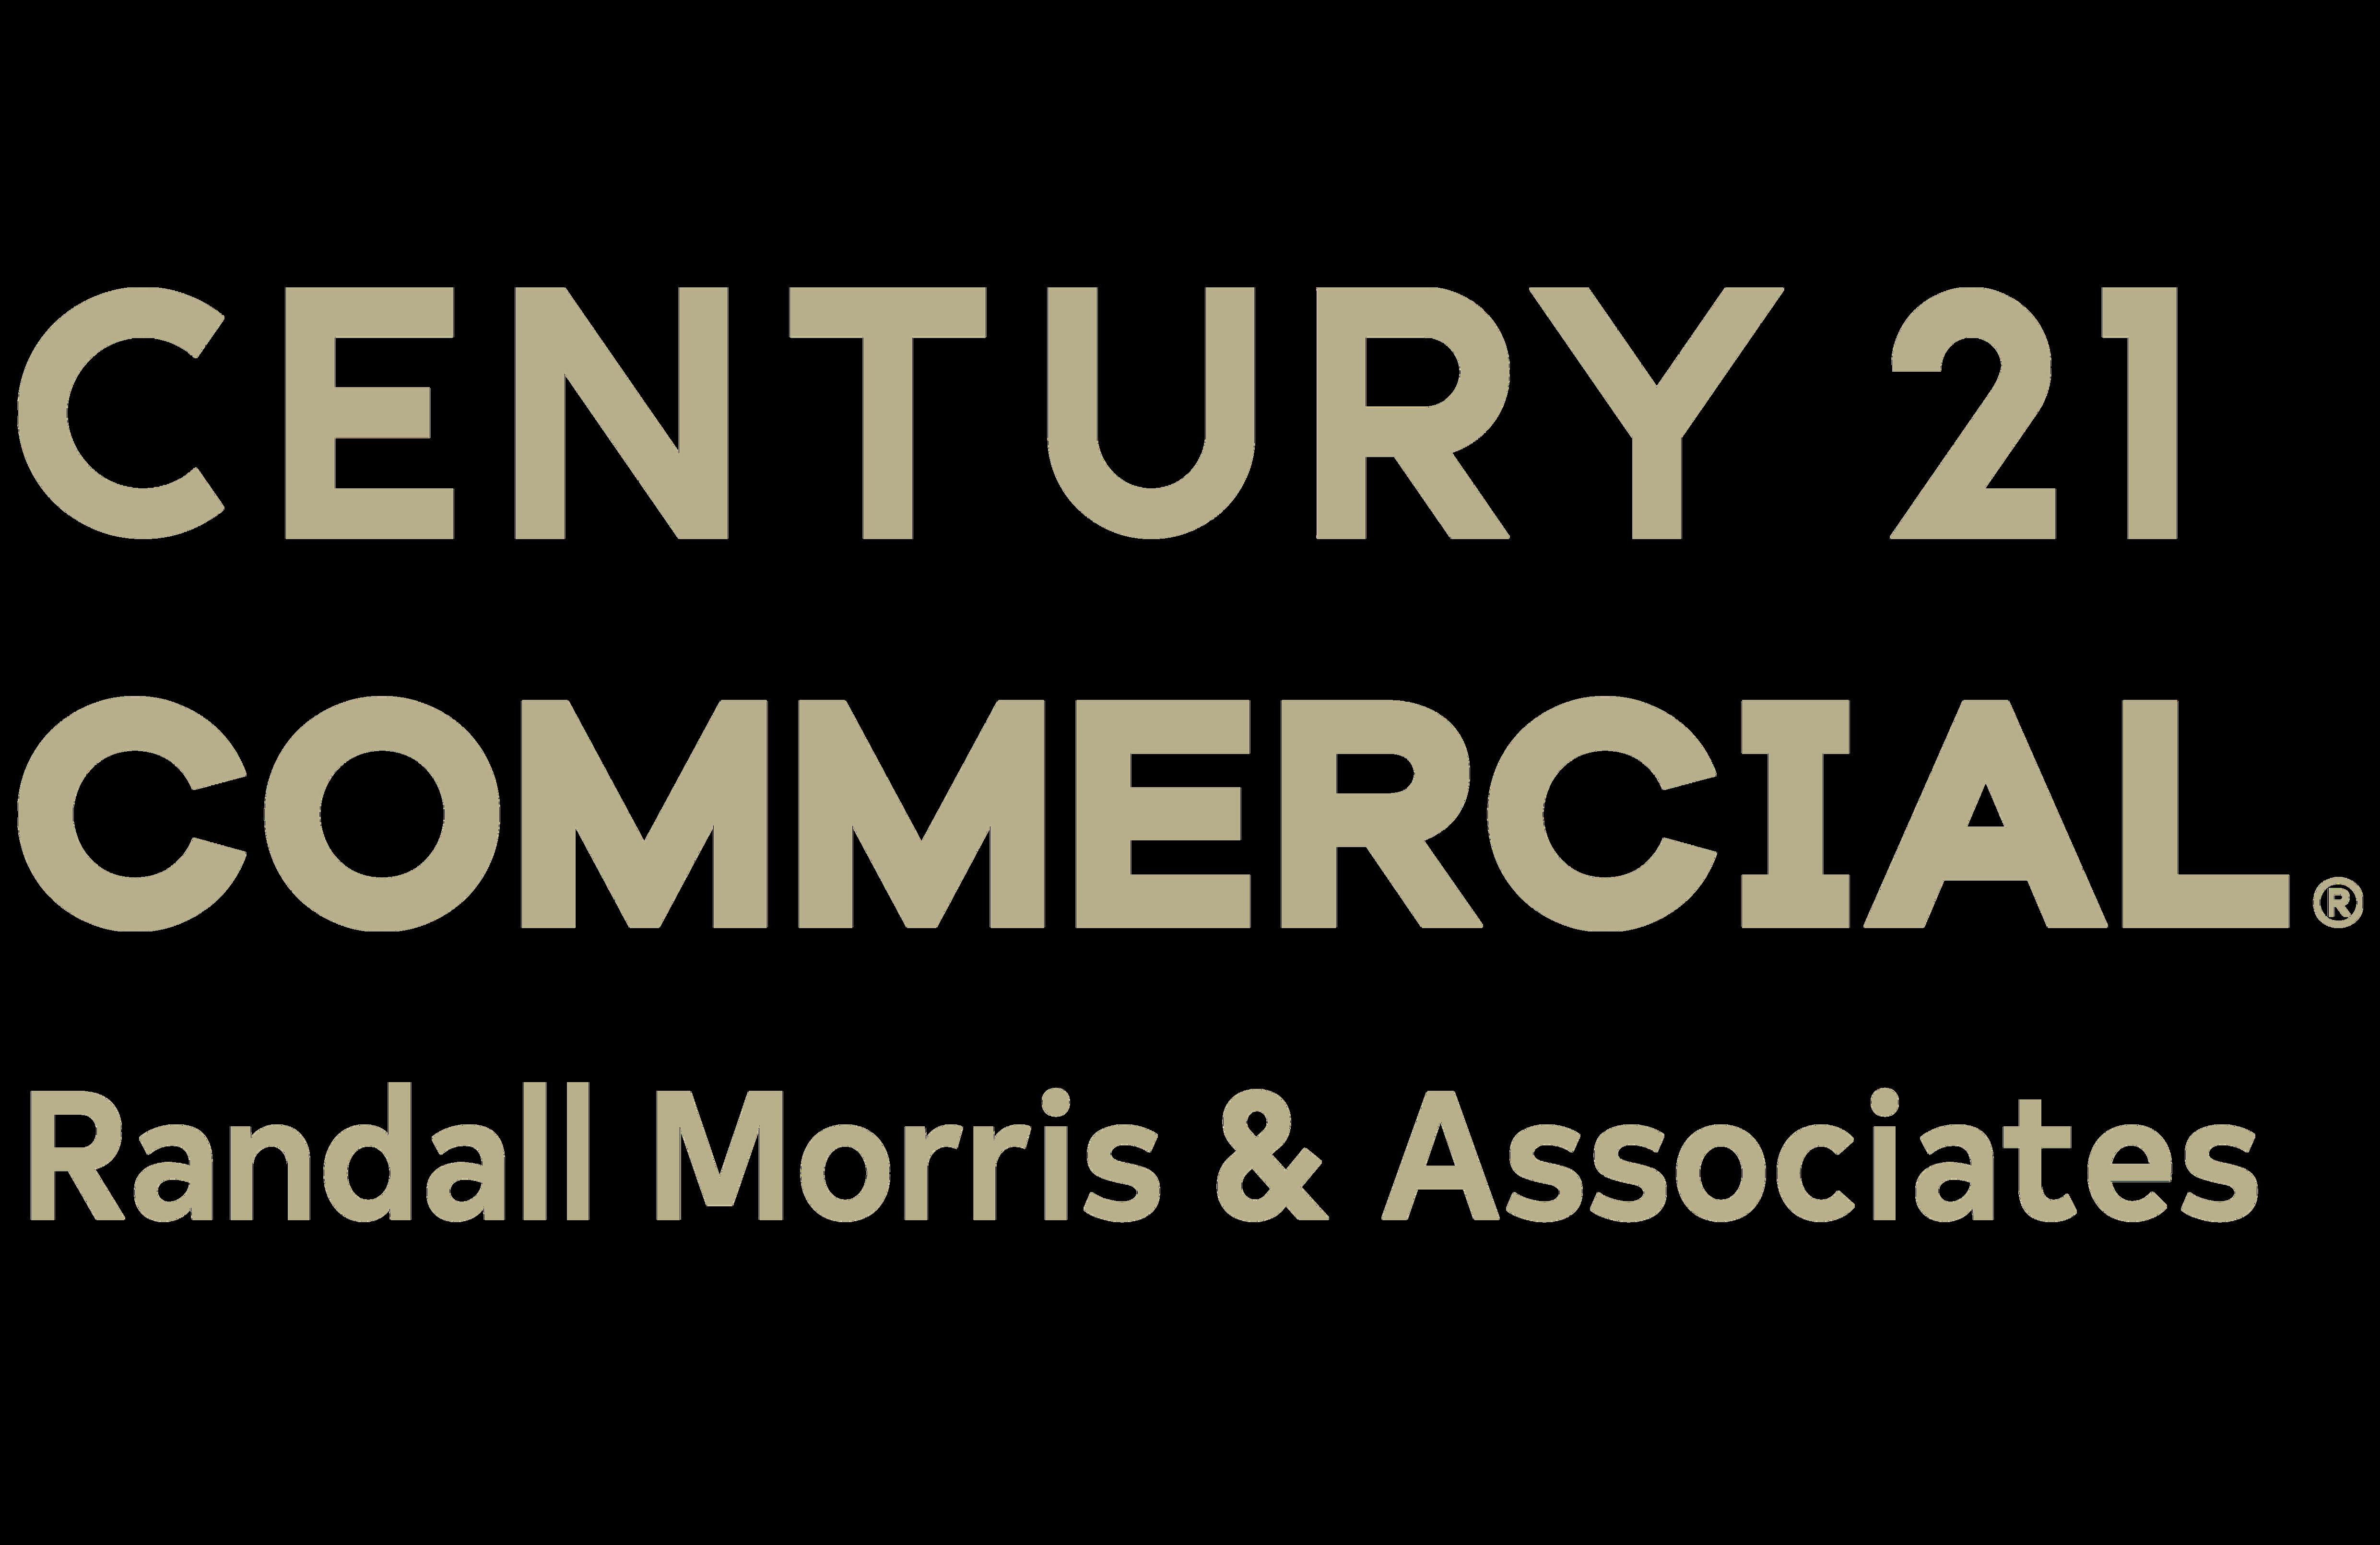 CENTURY 21 Randall Morris & Associates